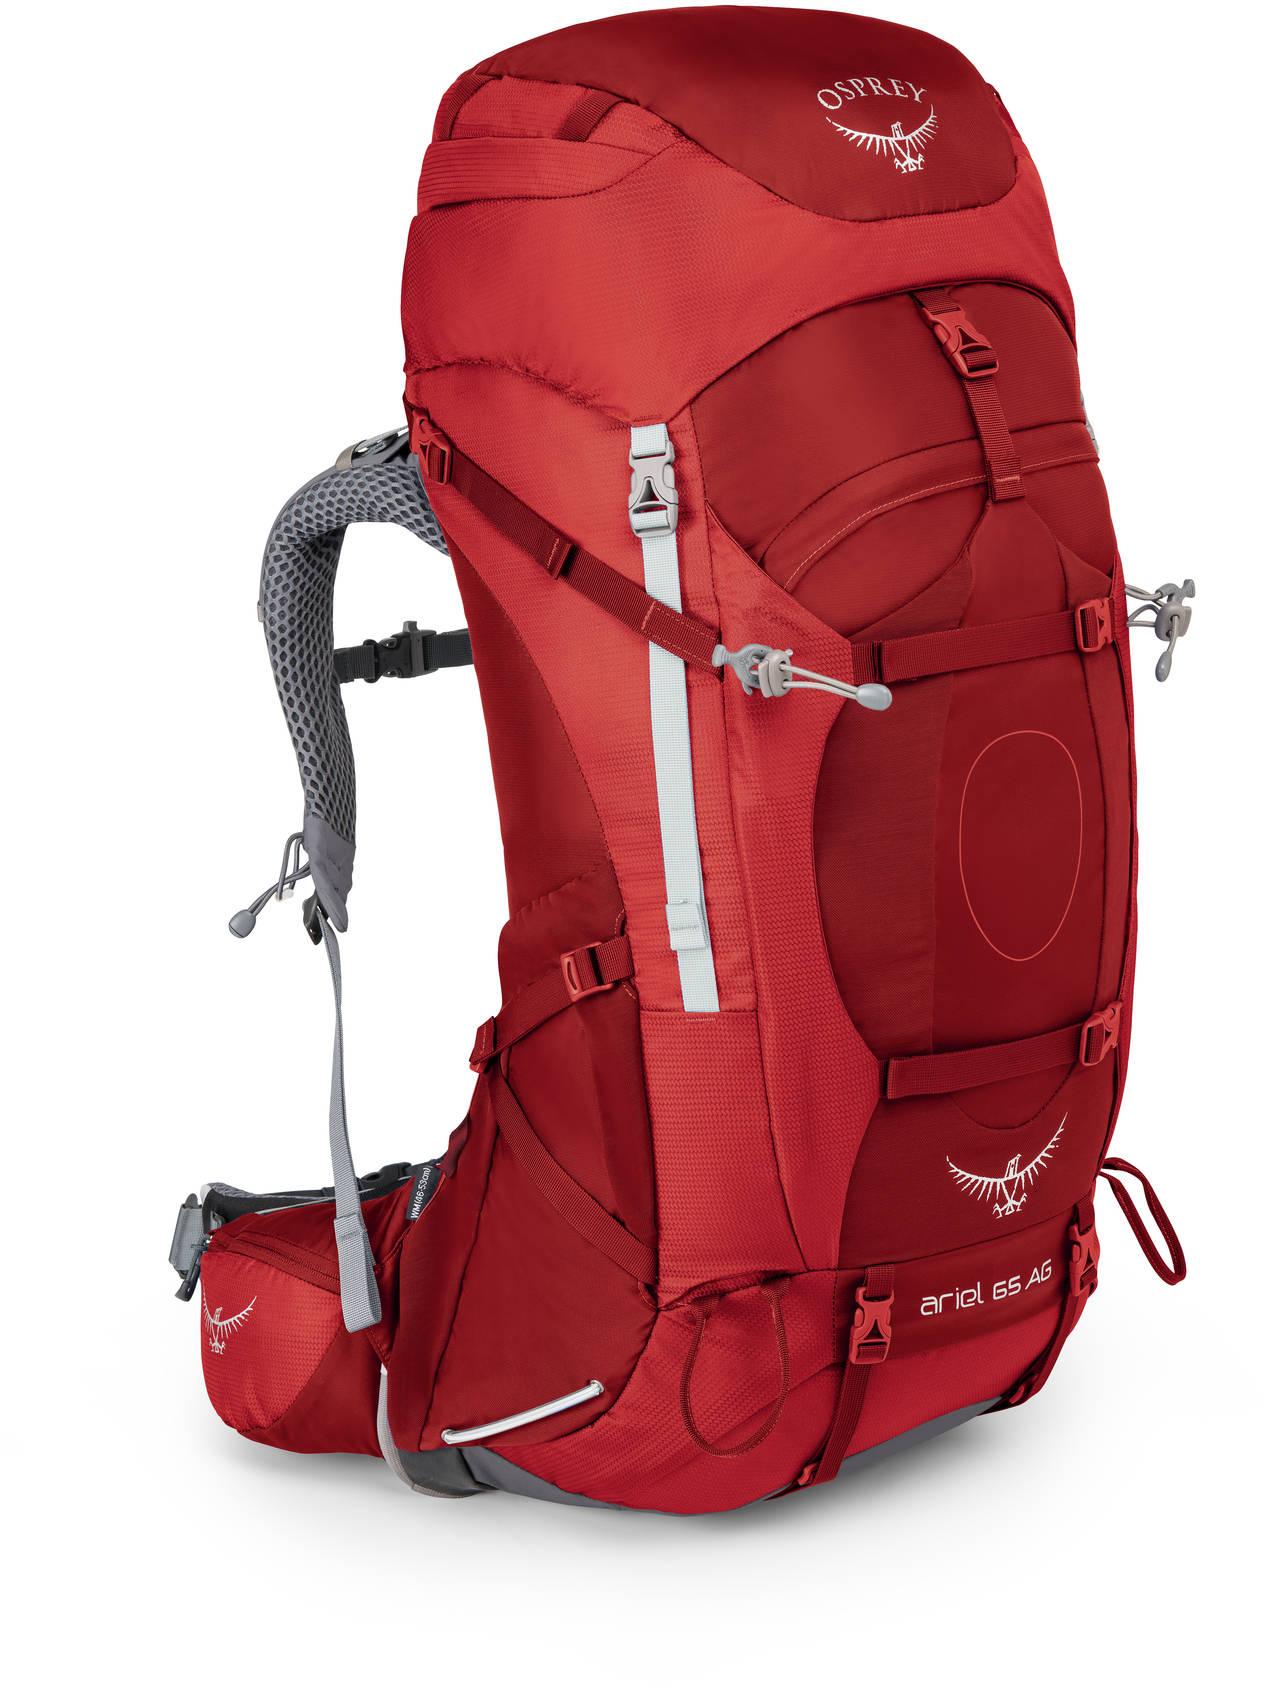 Туристические рюкзаки Рюкзак туристический женский Osprey Ariel AG 65 Ariel_AG_65_S17_Side_Picante_Red_web.jpg